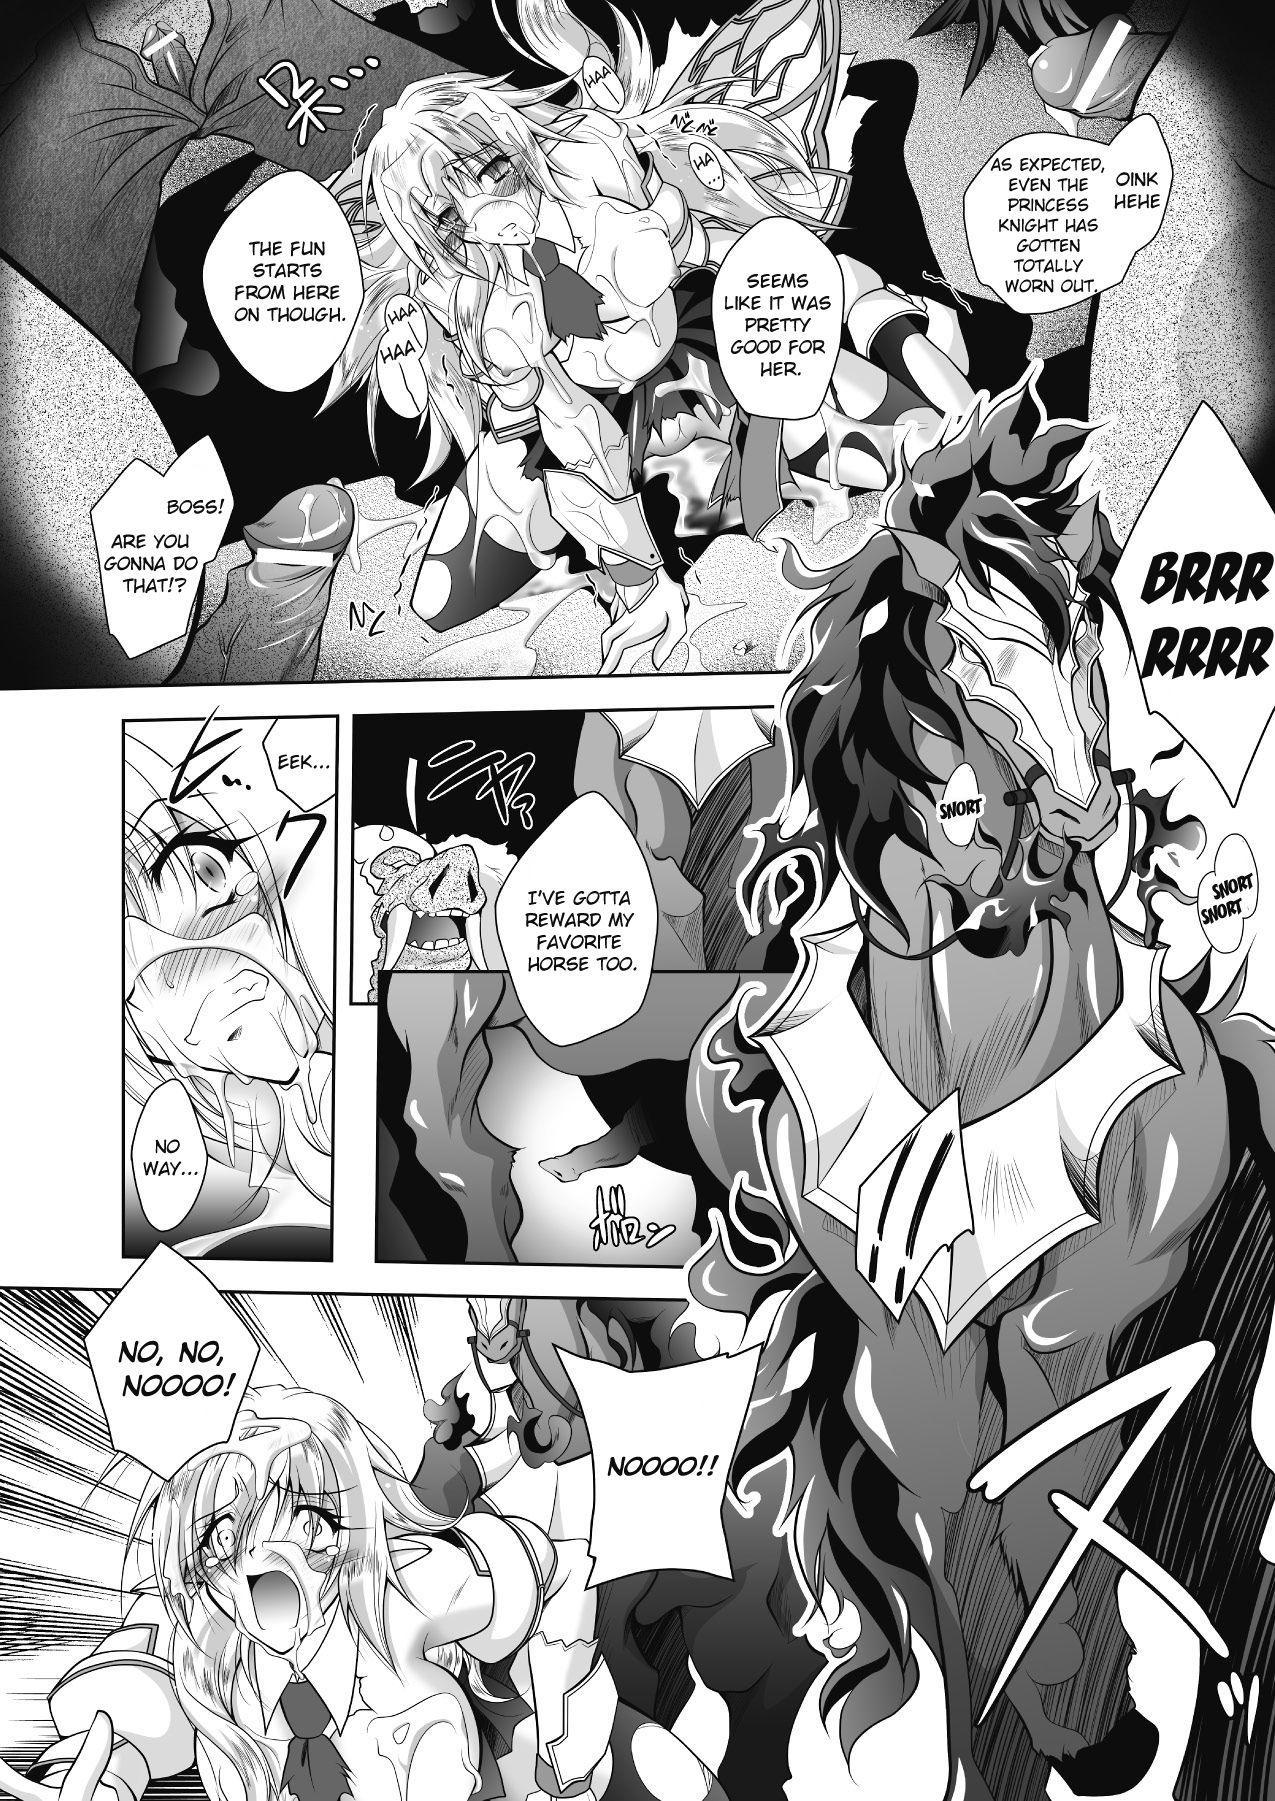 Juuyoku ni Kegareta Erufu Hime Kishi Sefiria | An Elf Sullied by Bestial Lust Princess Knight Sefiria 17